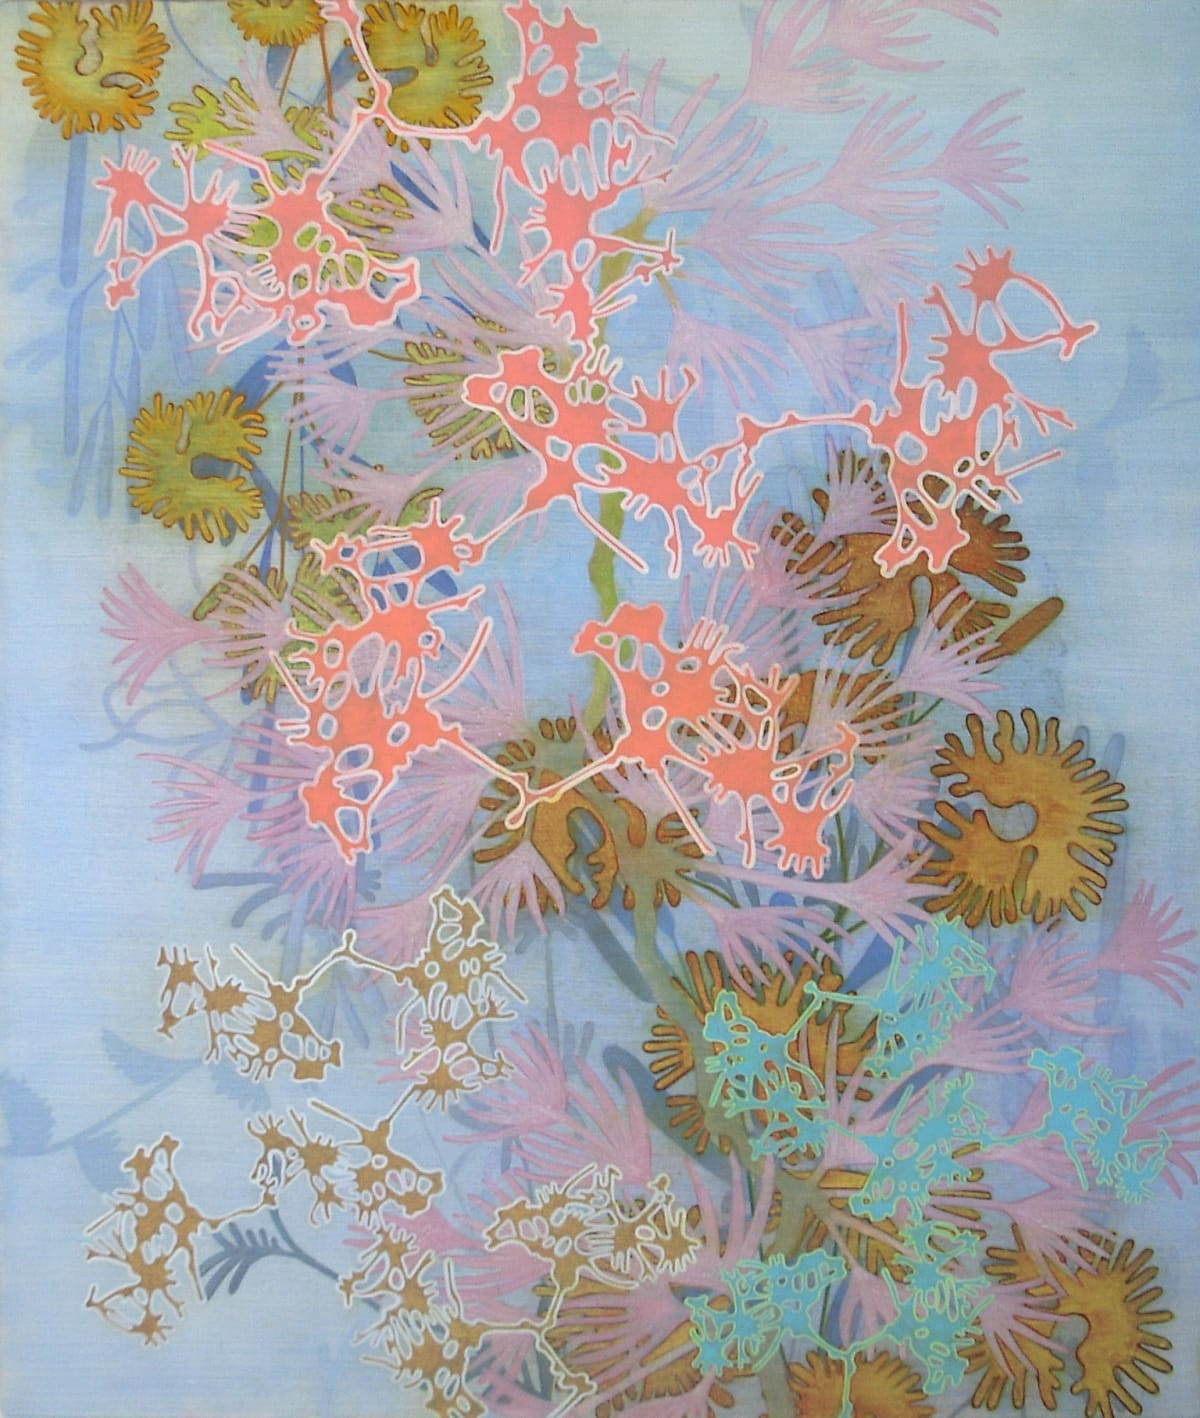 Annette Davidek Untitled, #18-06, 2018 oil on birch panel 38 x 32 in.